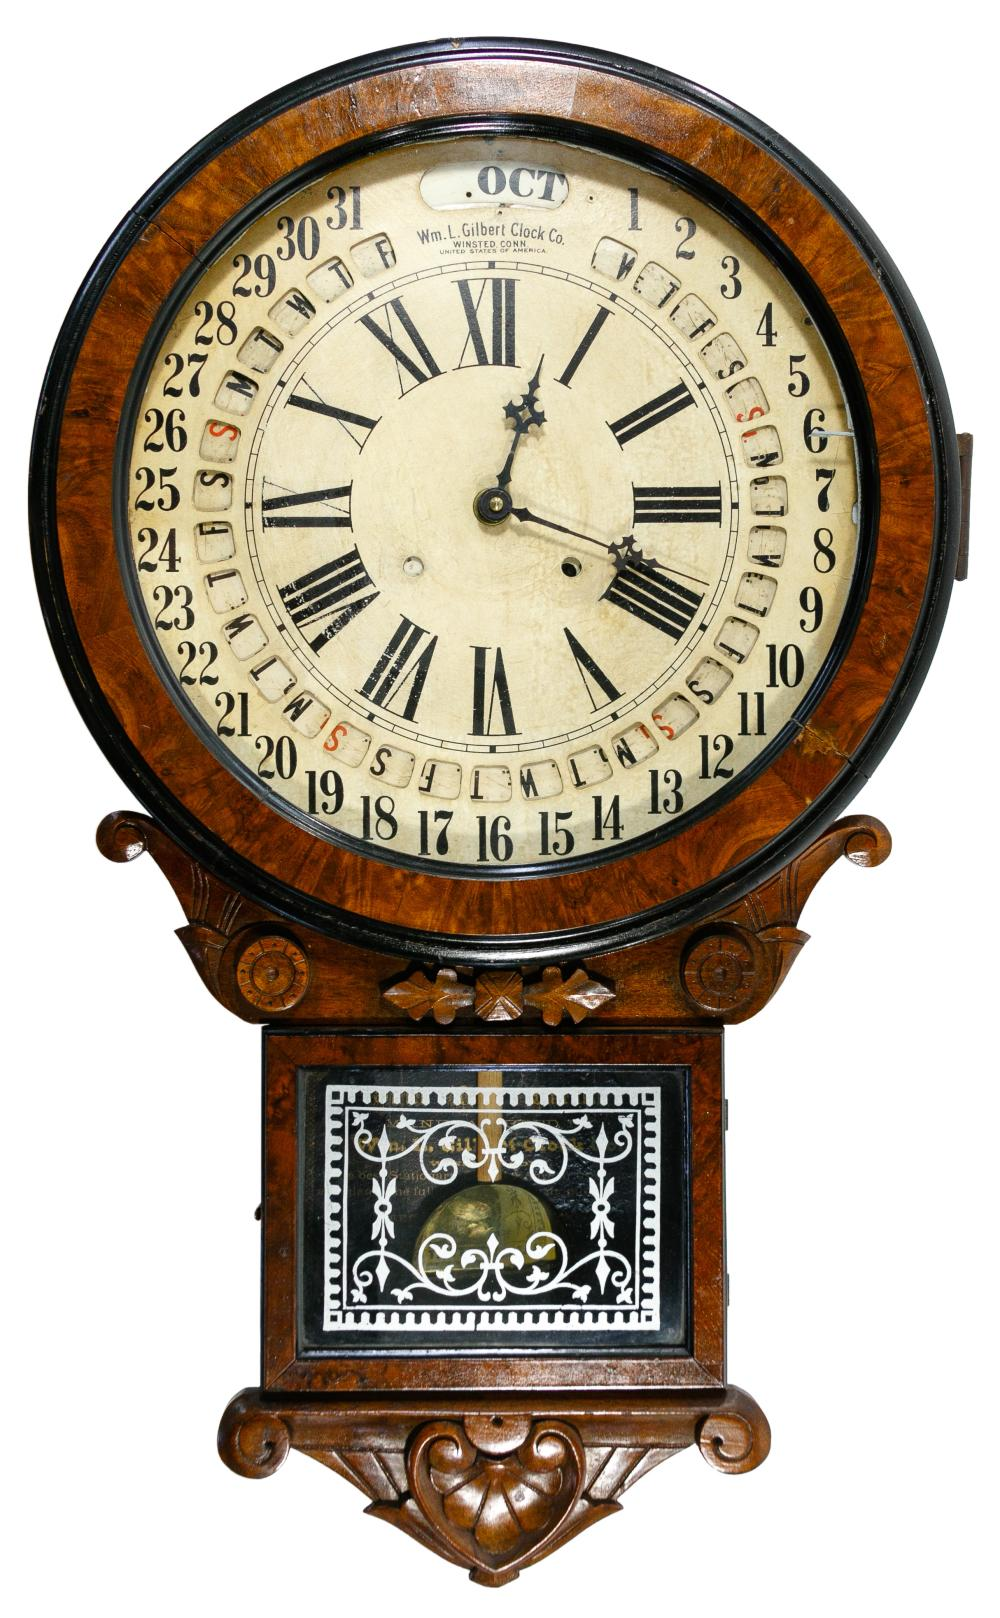 Wm. L. Gilbert Clock Company Victorian Calendar Wall Clock